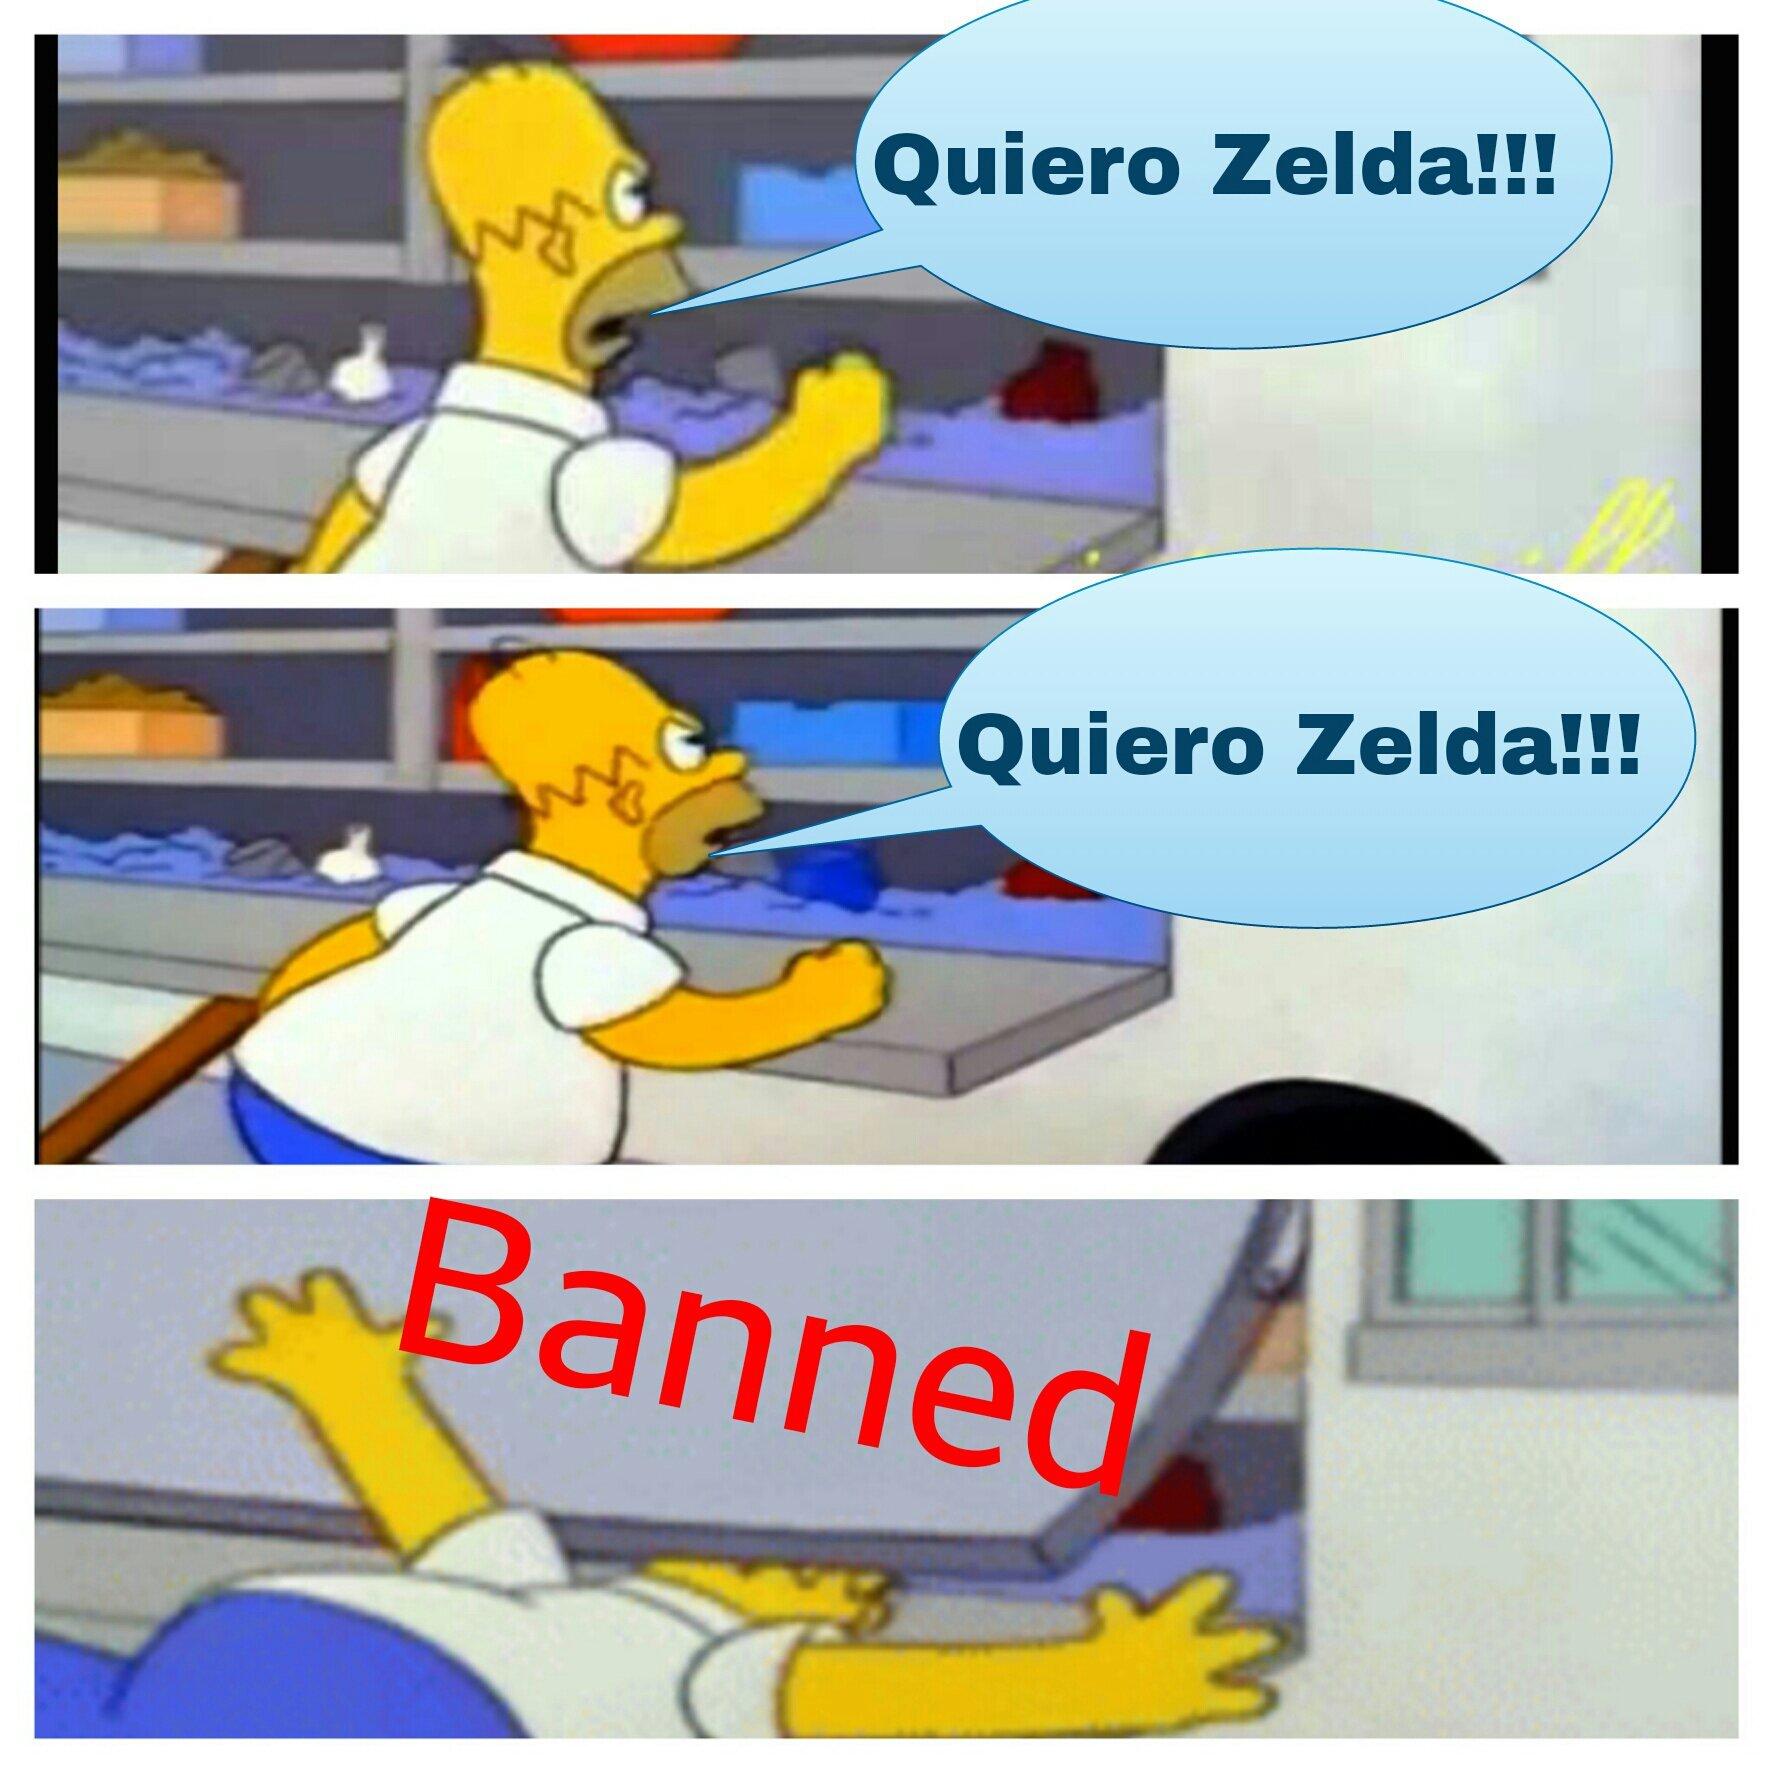 Queremos Zelda - meme